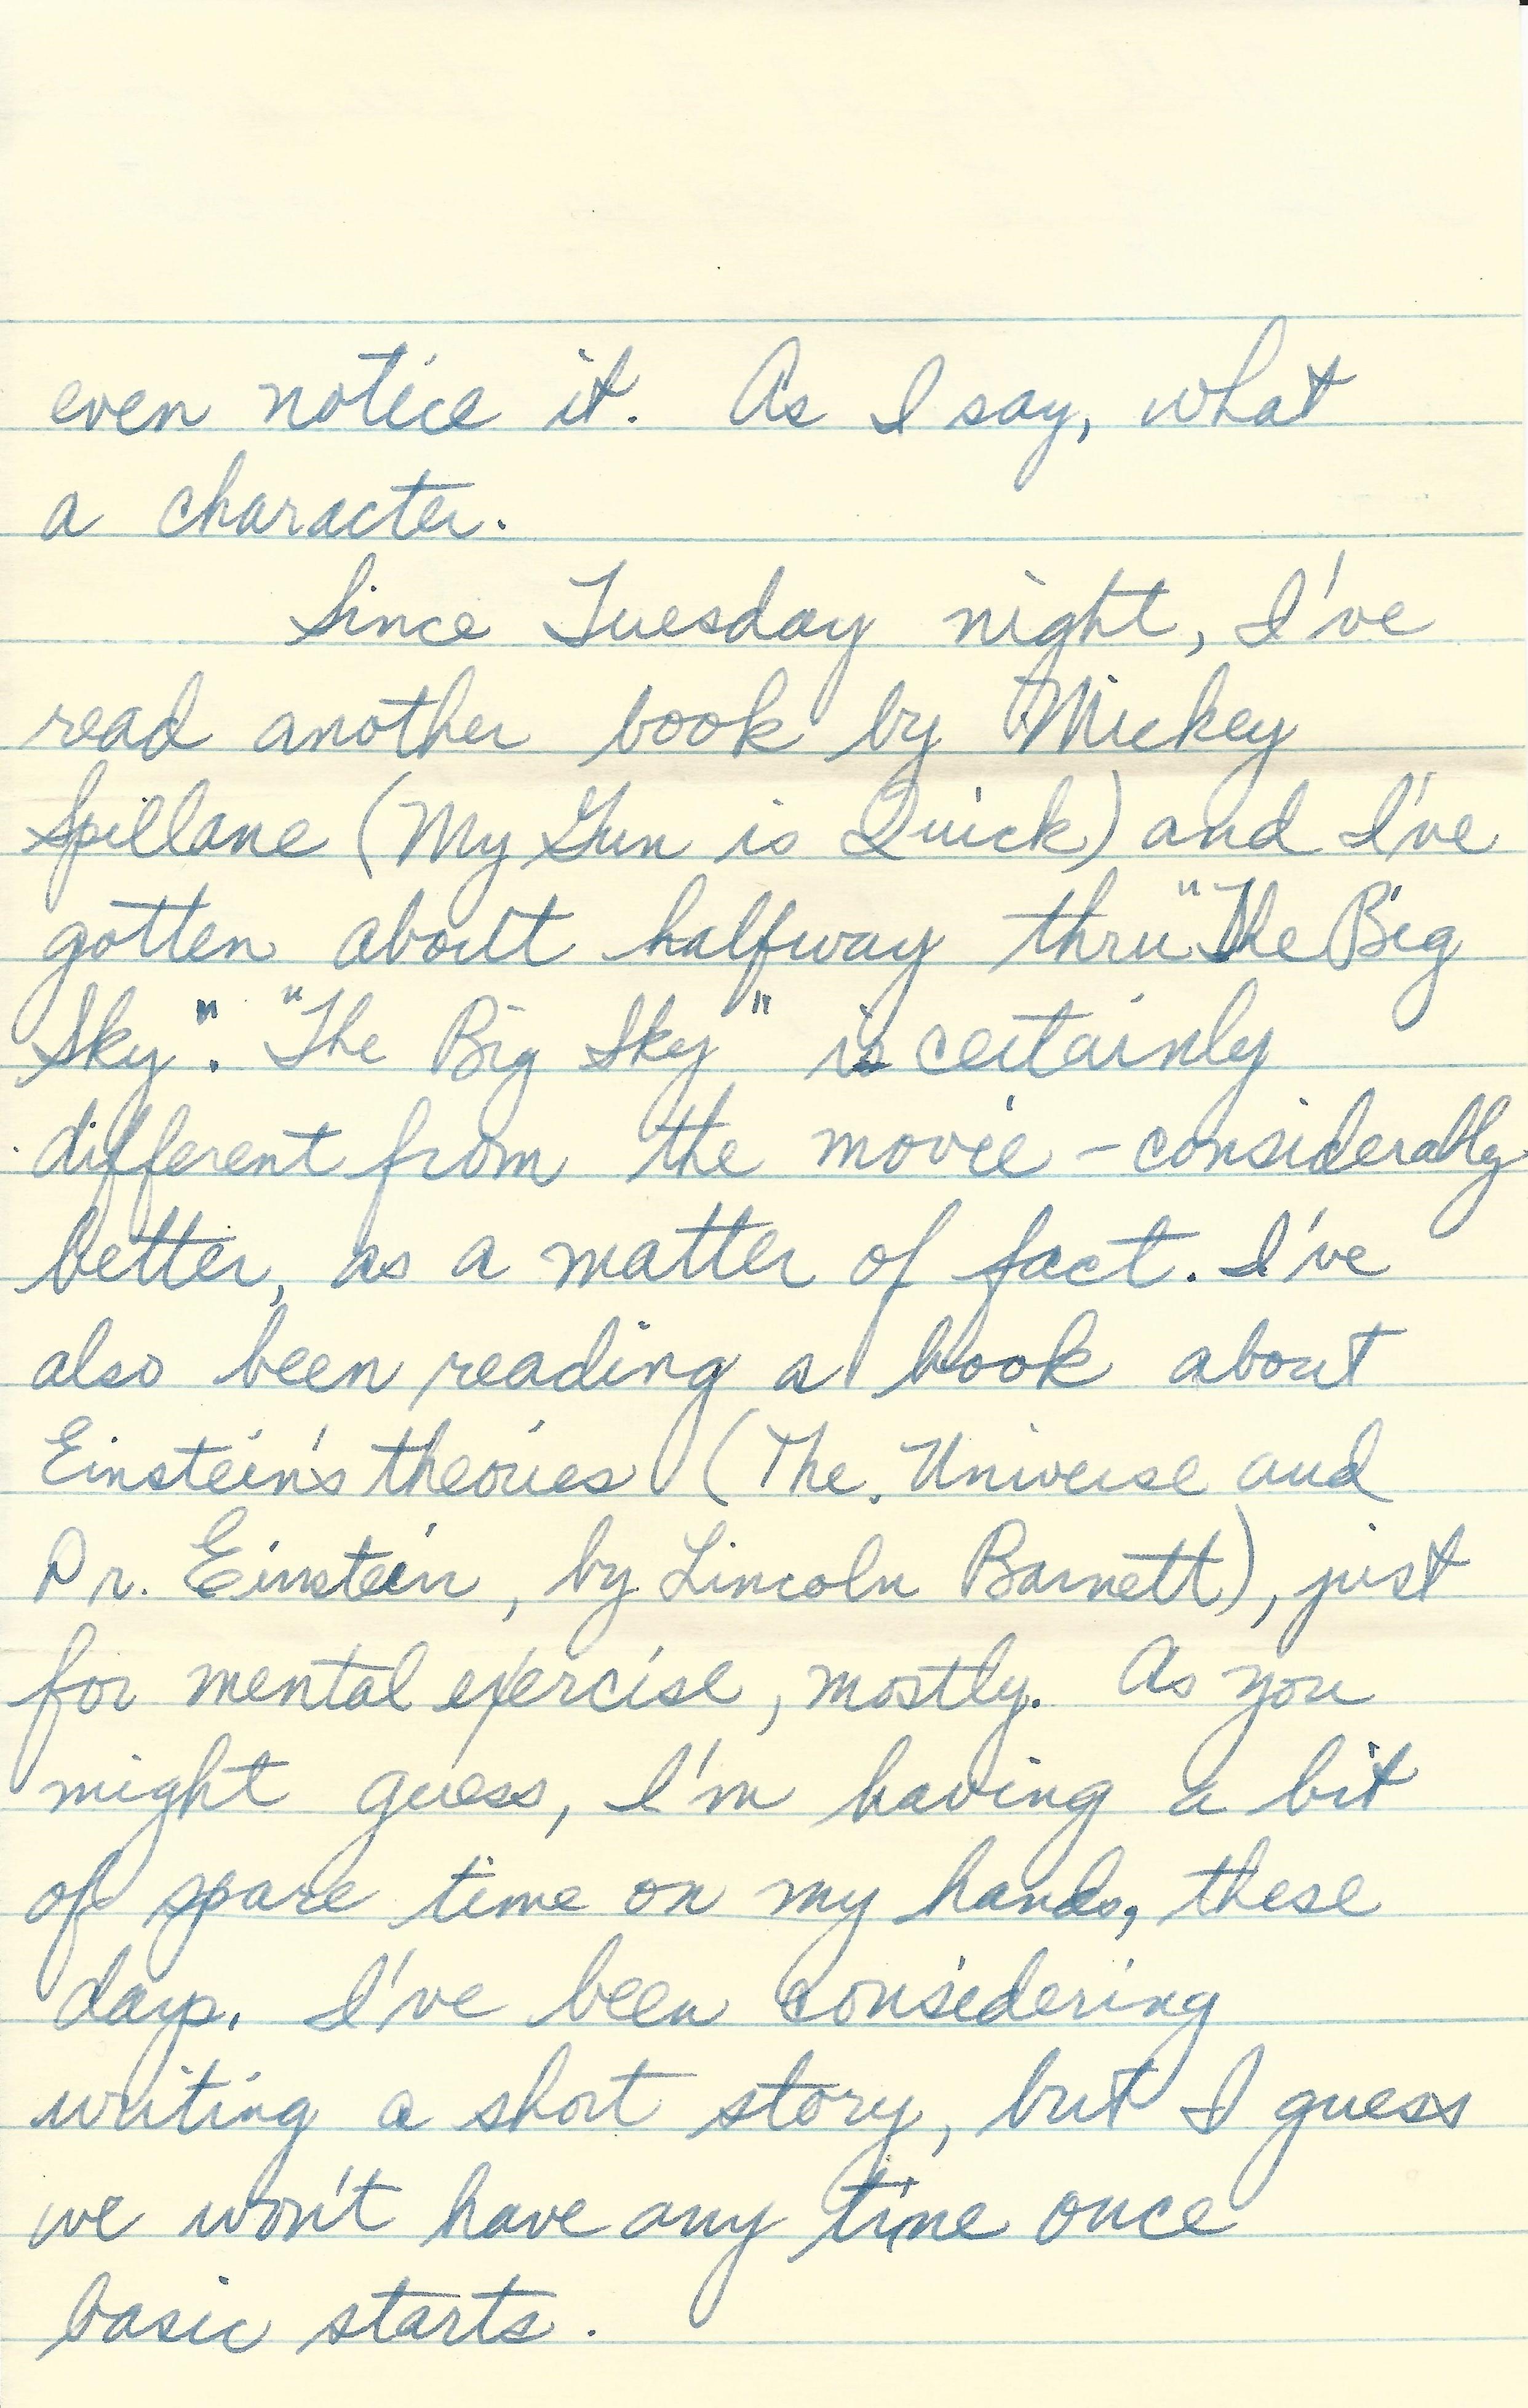 5. Oct. 16, 1952 (Opa)_Page_4.jpg